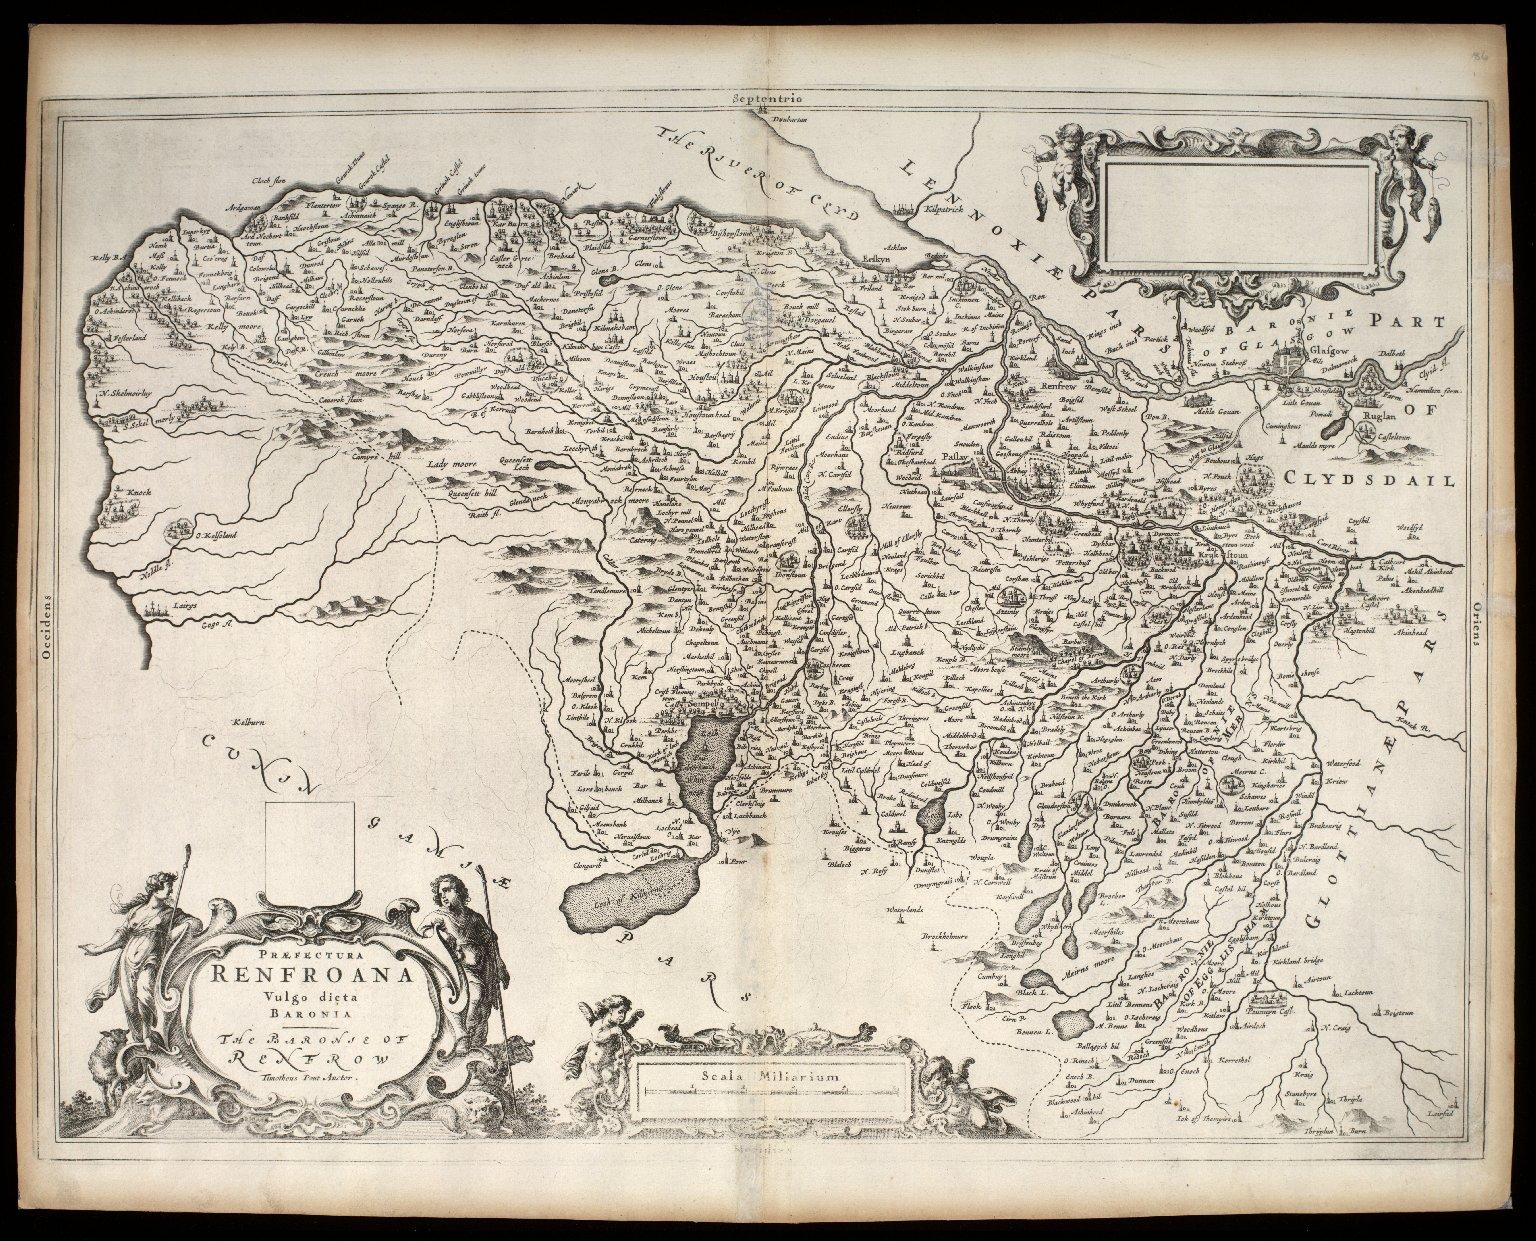 Praefectura Renfroana, vulgo dicta Baronia. The Baronie of Renfrow [i.e. Renfrew] [1 of 1]